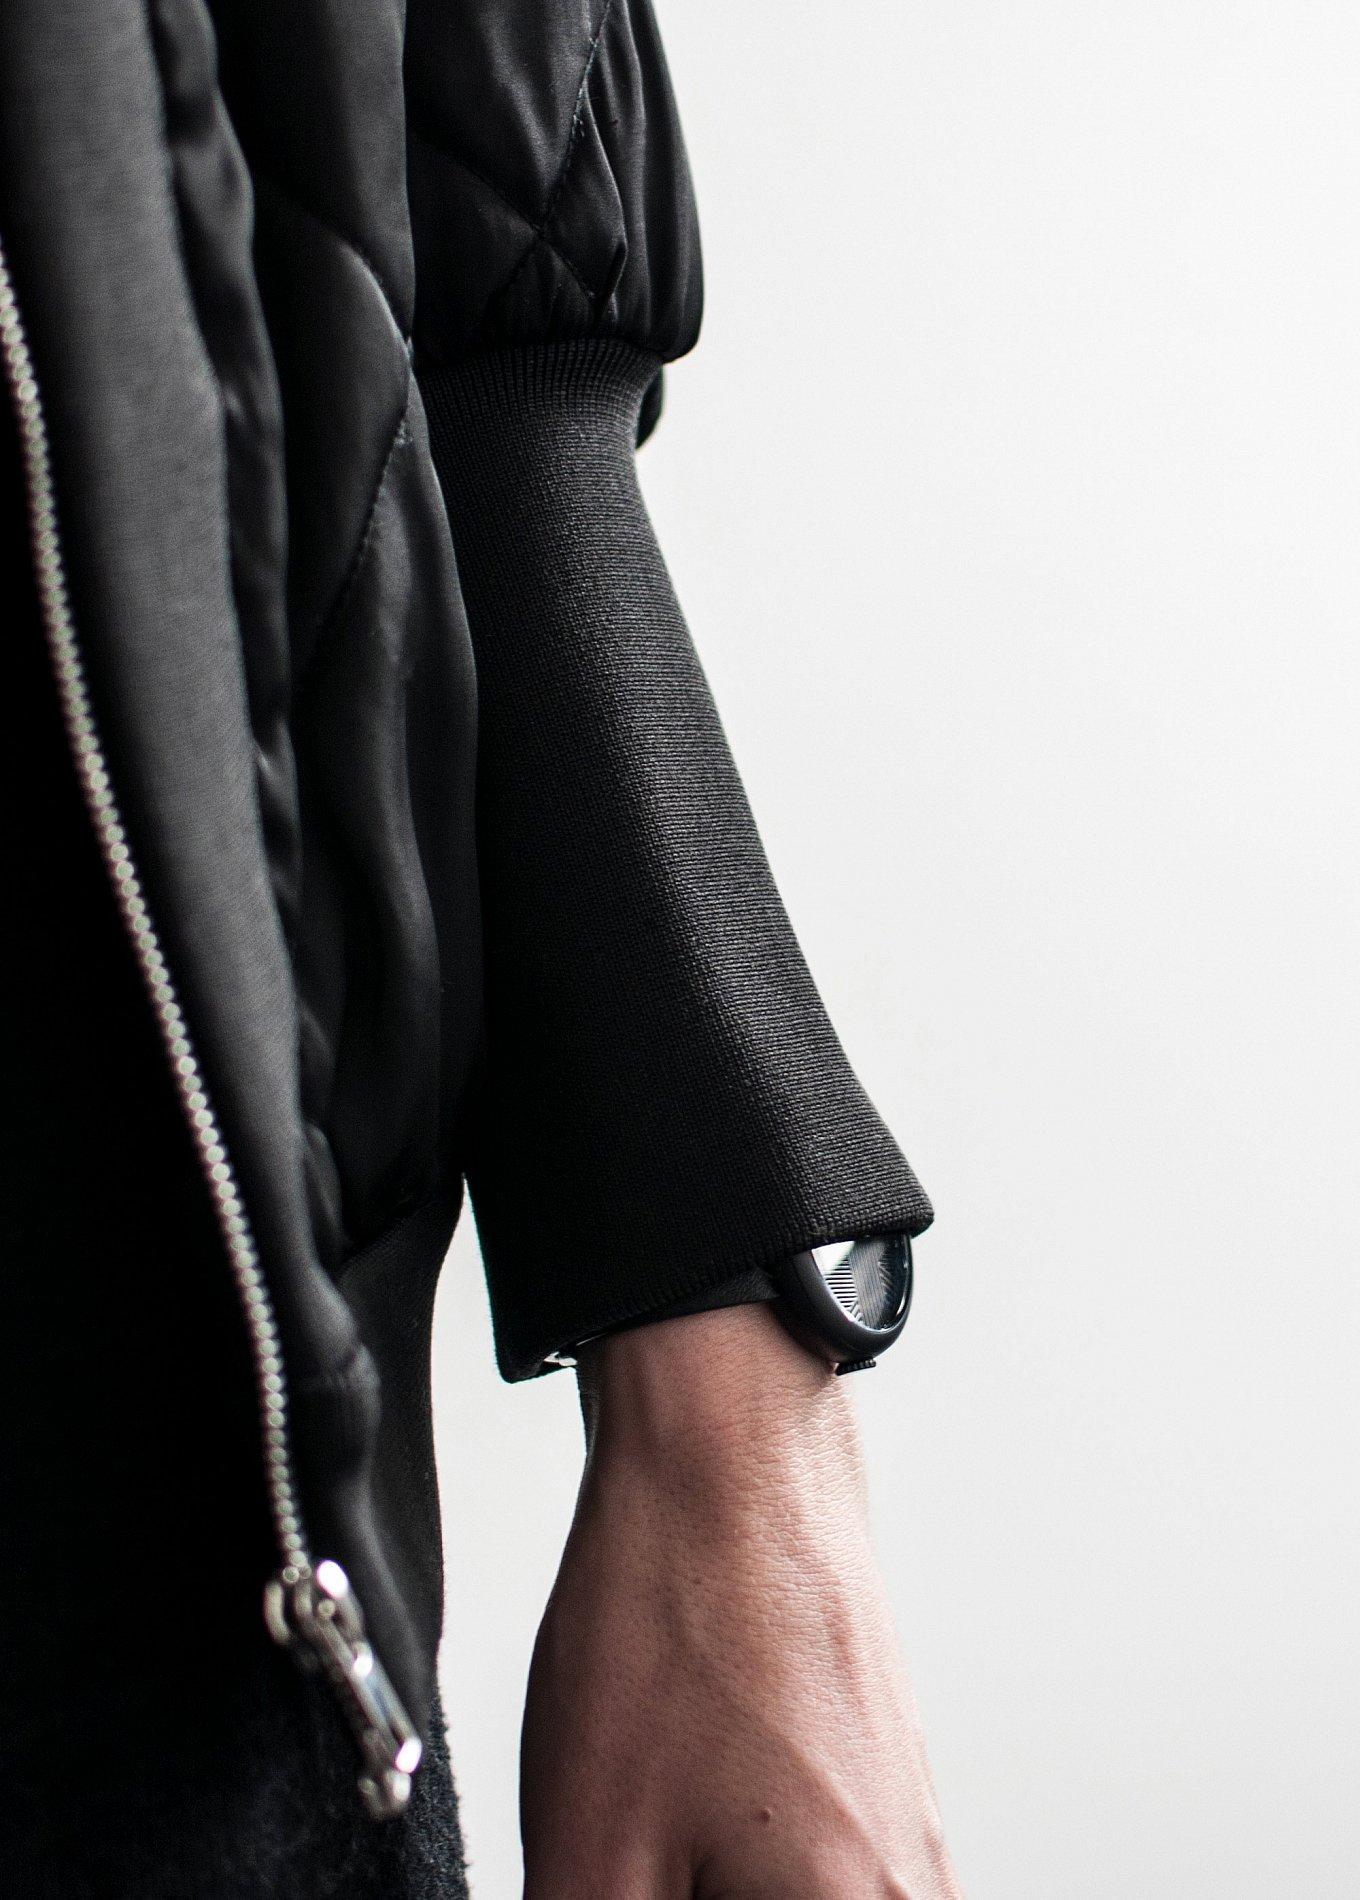 objest-minimalist-automatic-watches-1